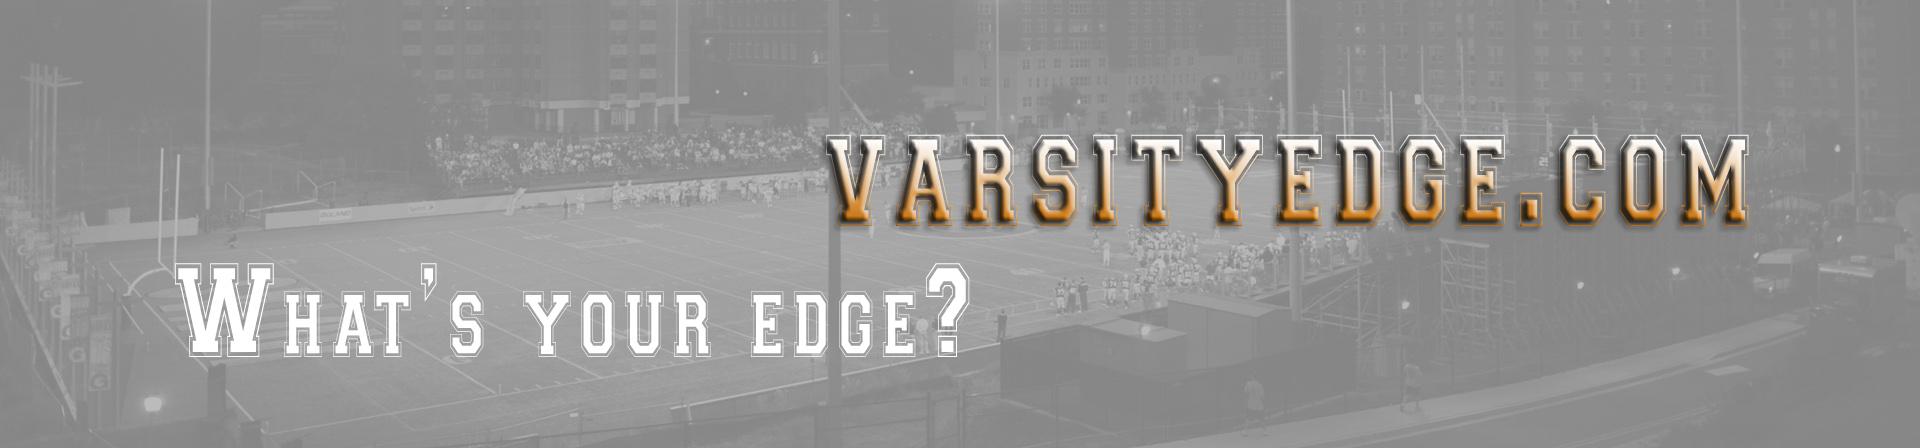 Varsityedge.com College Athletic Recruiting Process